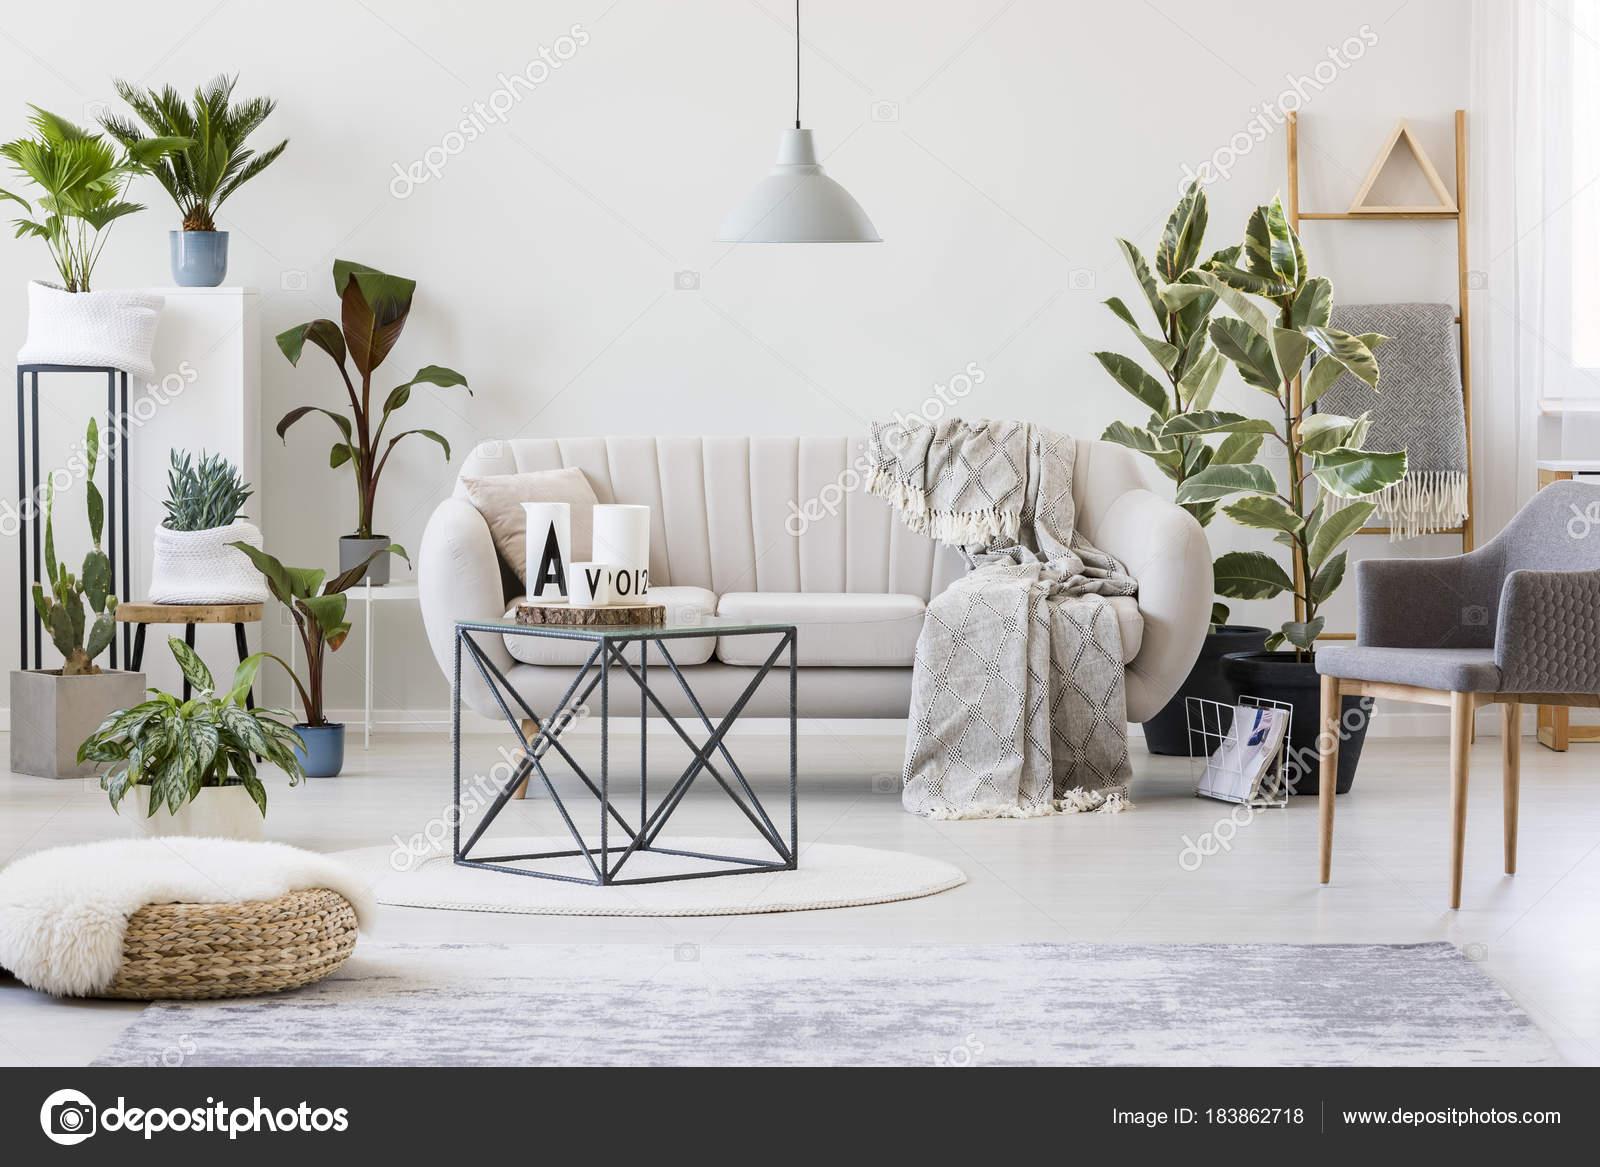 Plants In Botanic Living Room — Stock Photo © Photographee ... intérieur Botanic Salon De Jardin